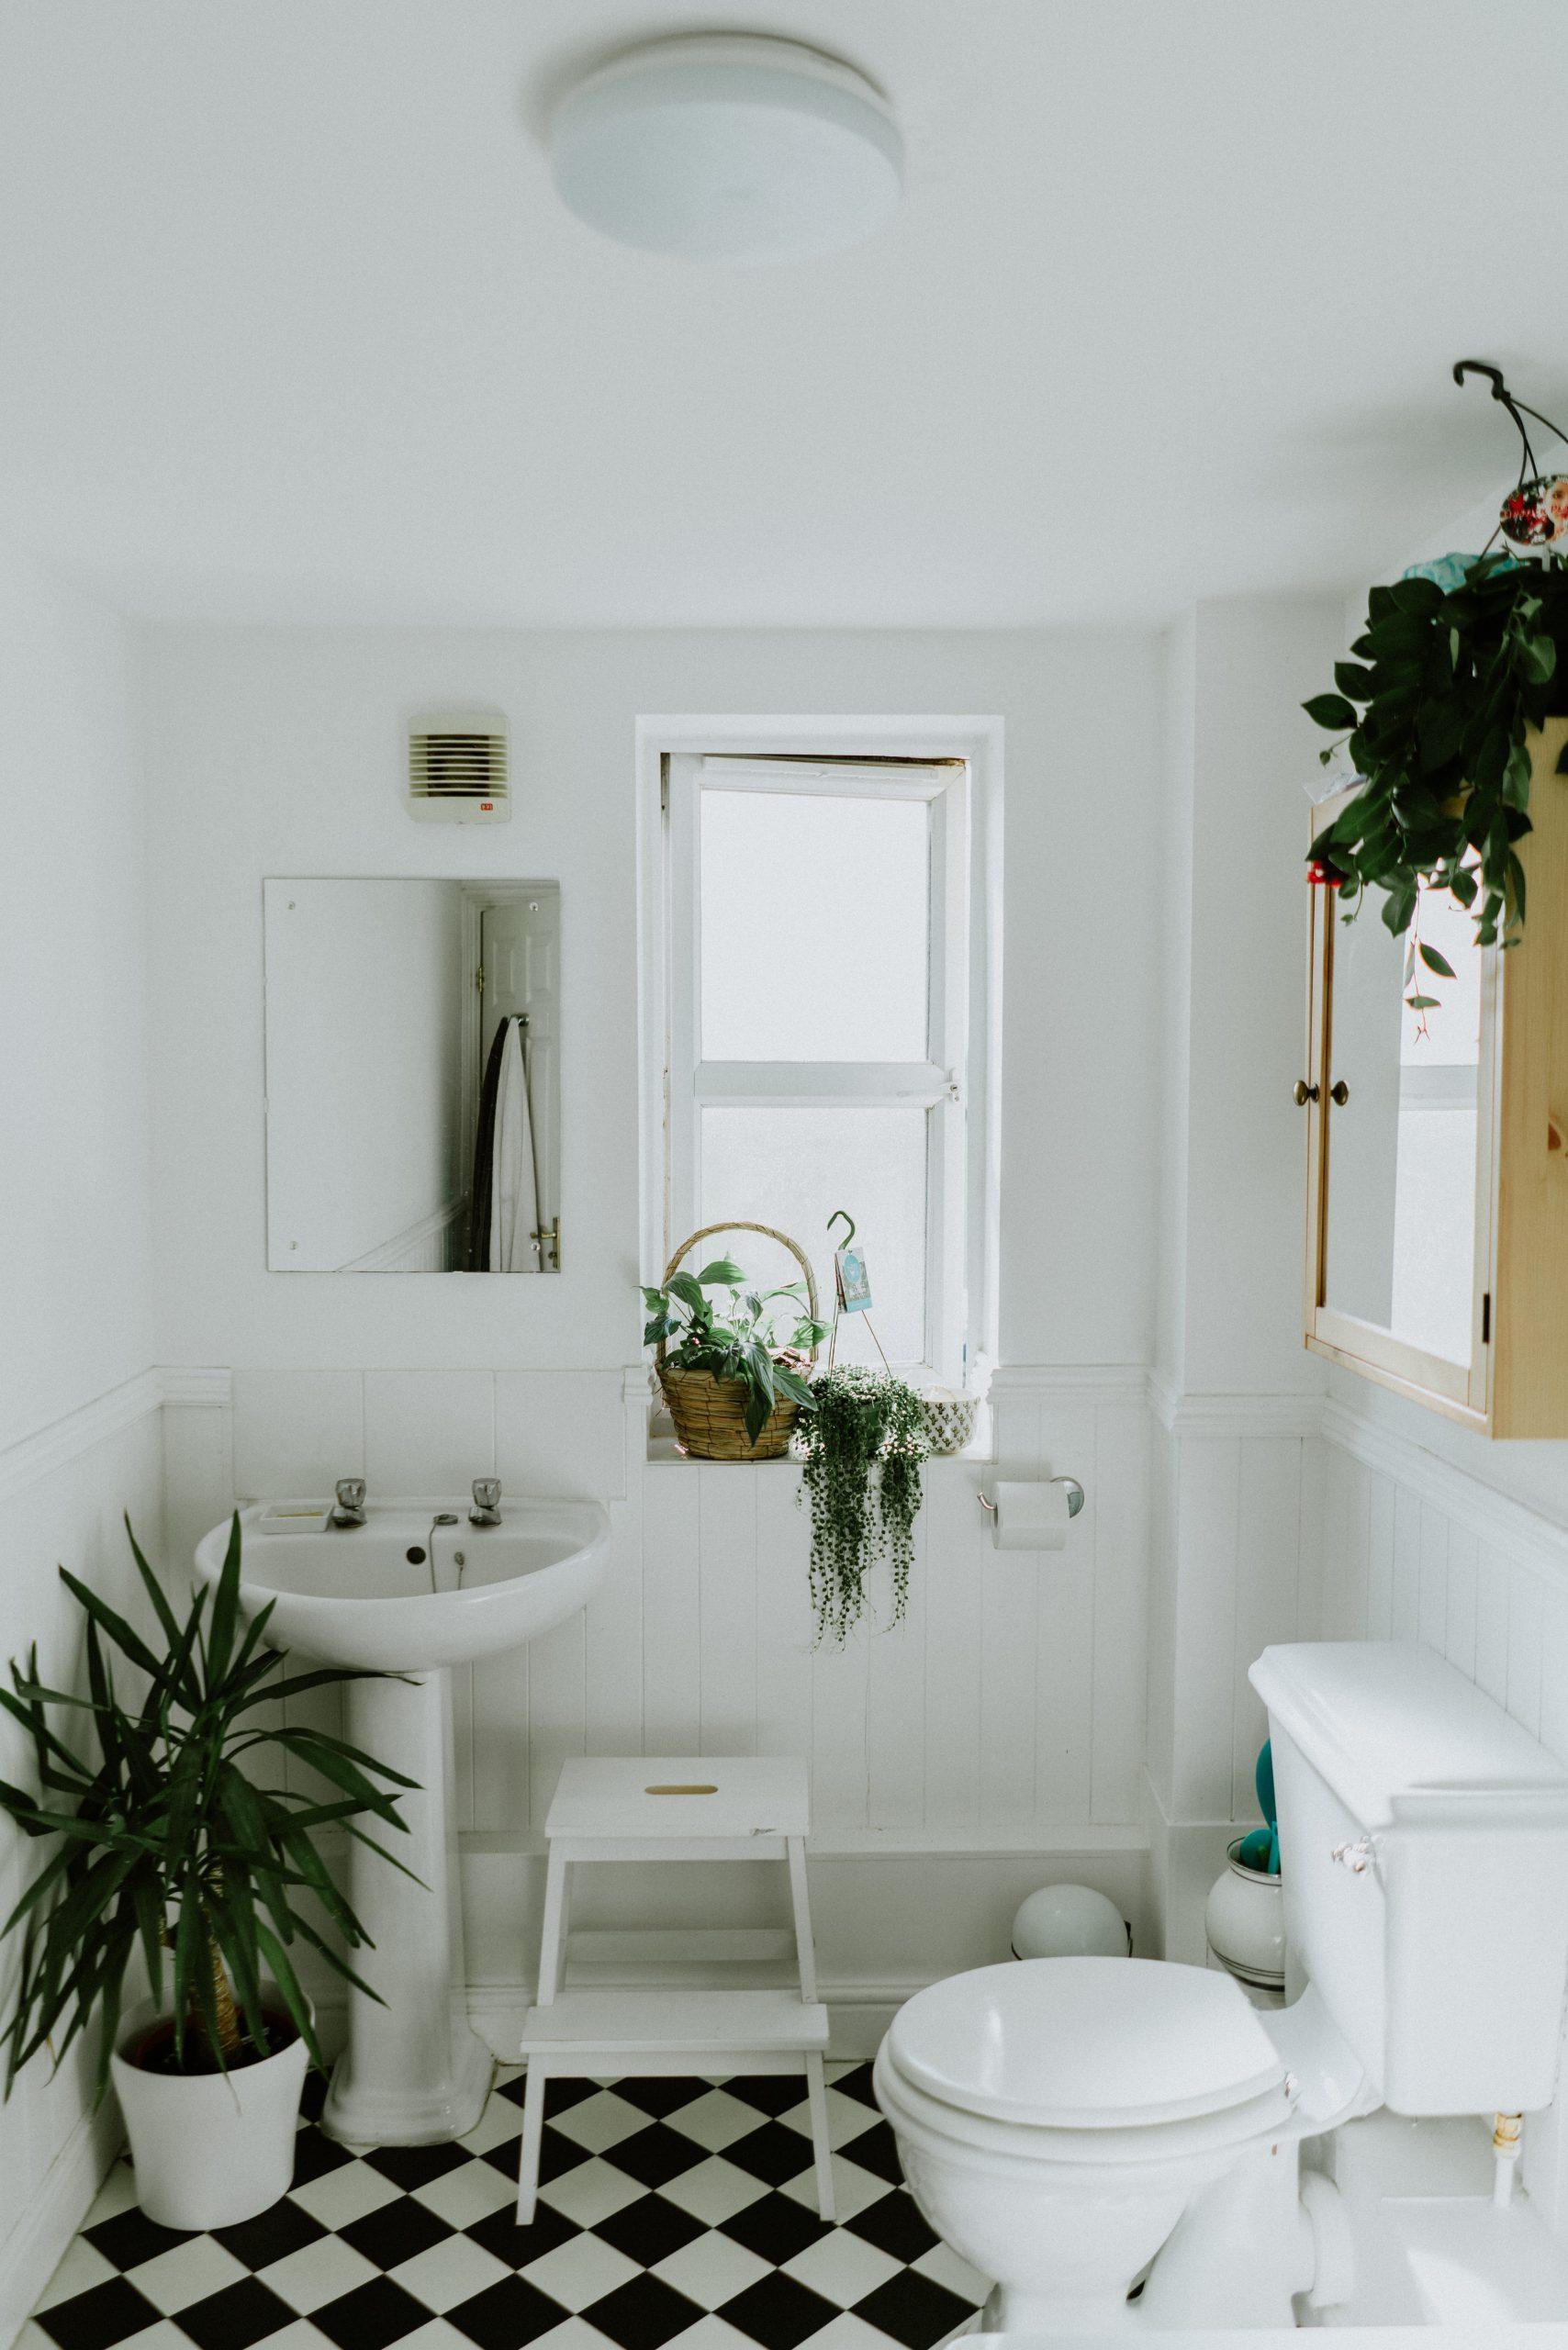 Top 5 Best Ways of Renovating a Bathroom